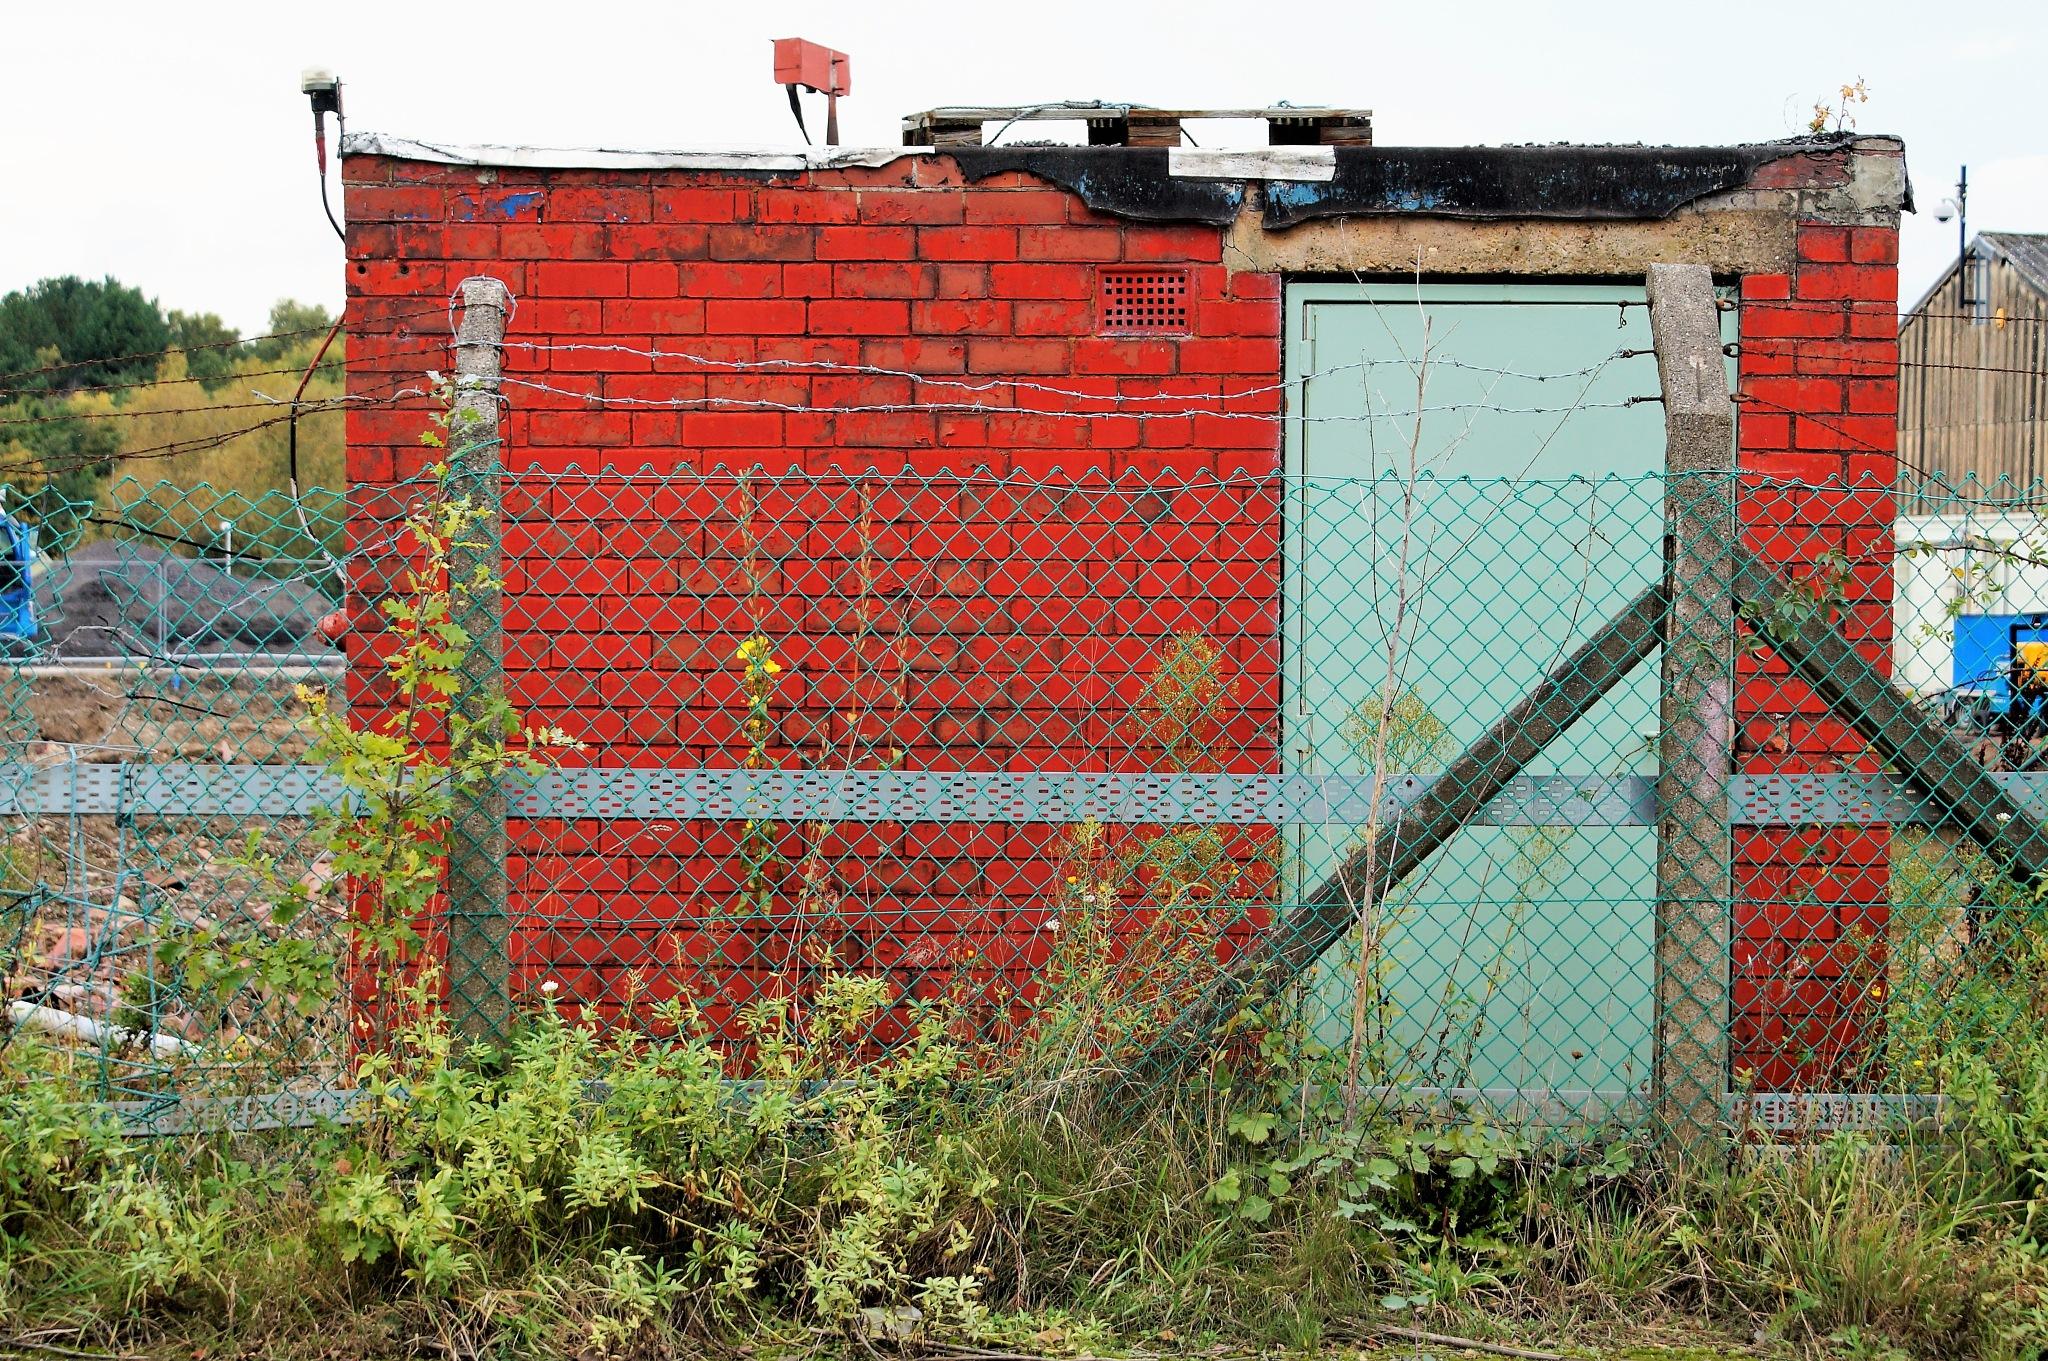 Red Bricked Buiding by DenisJosephDalby